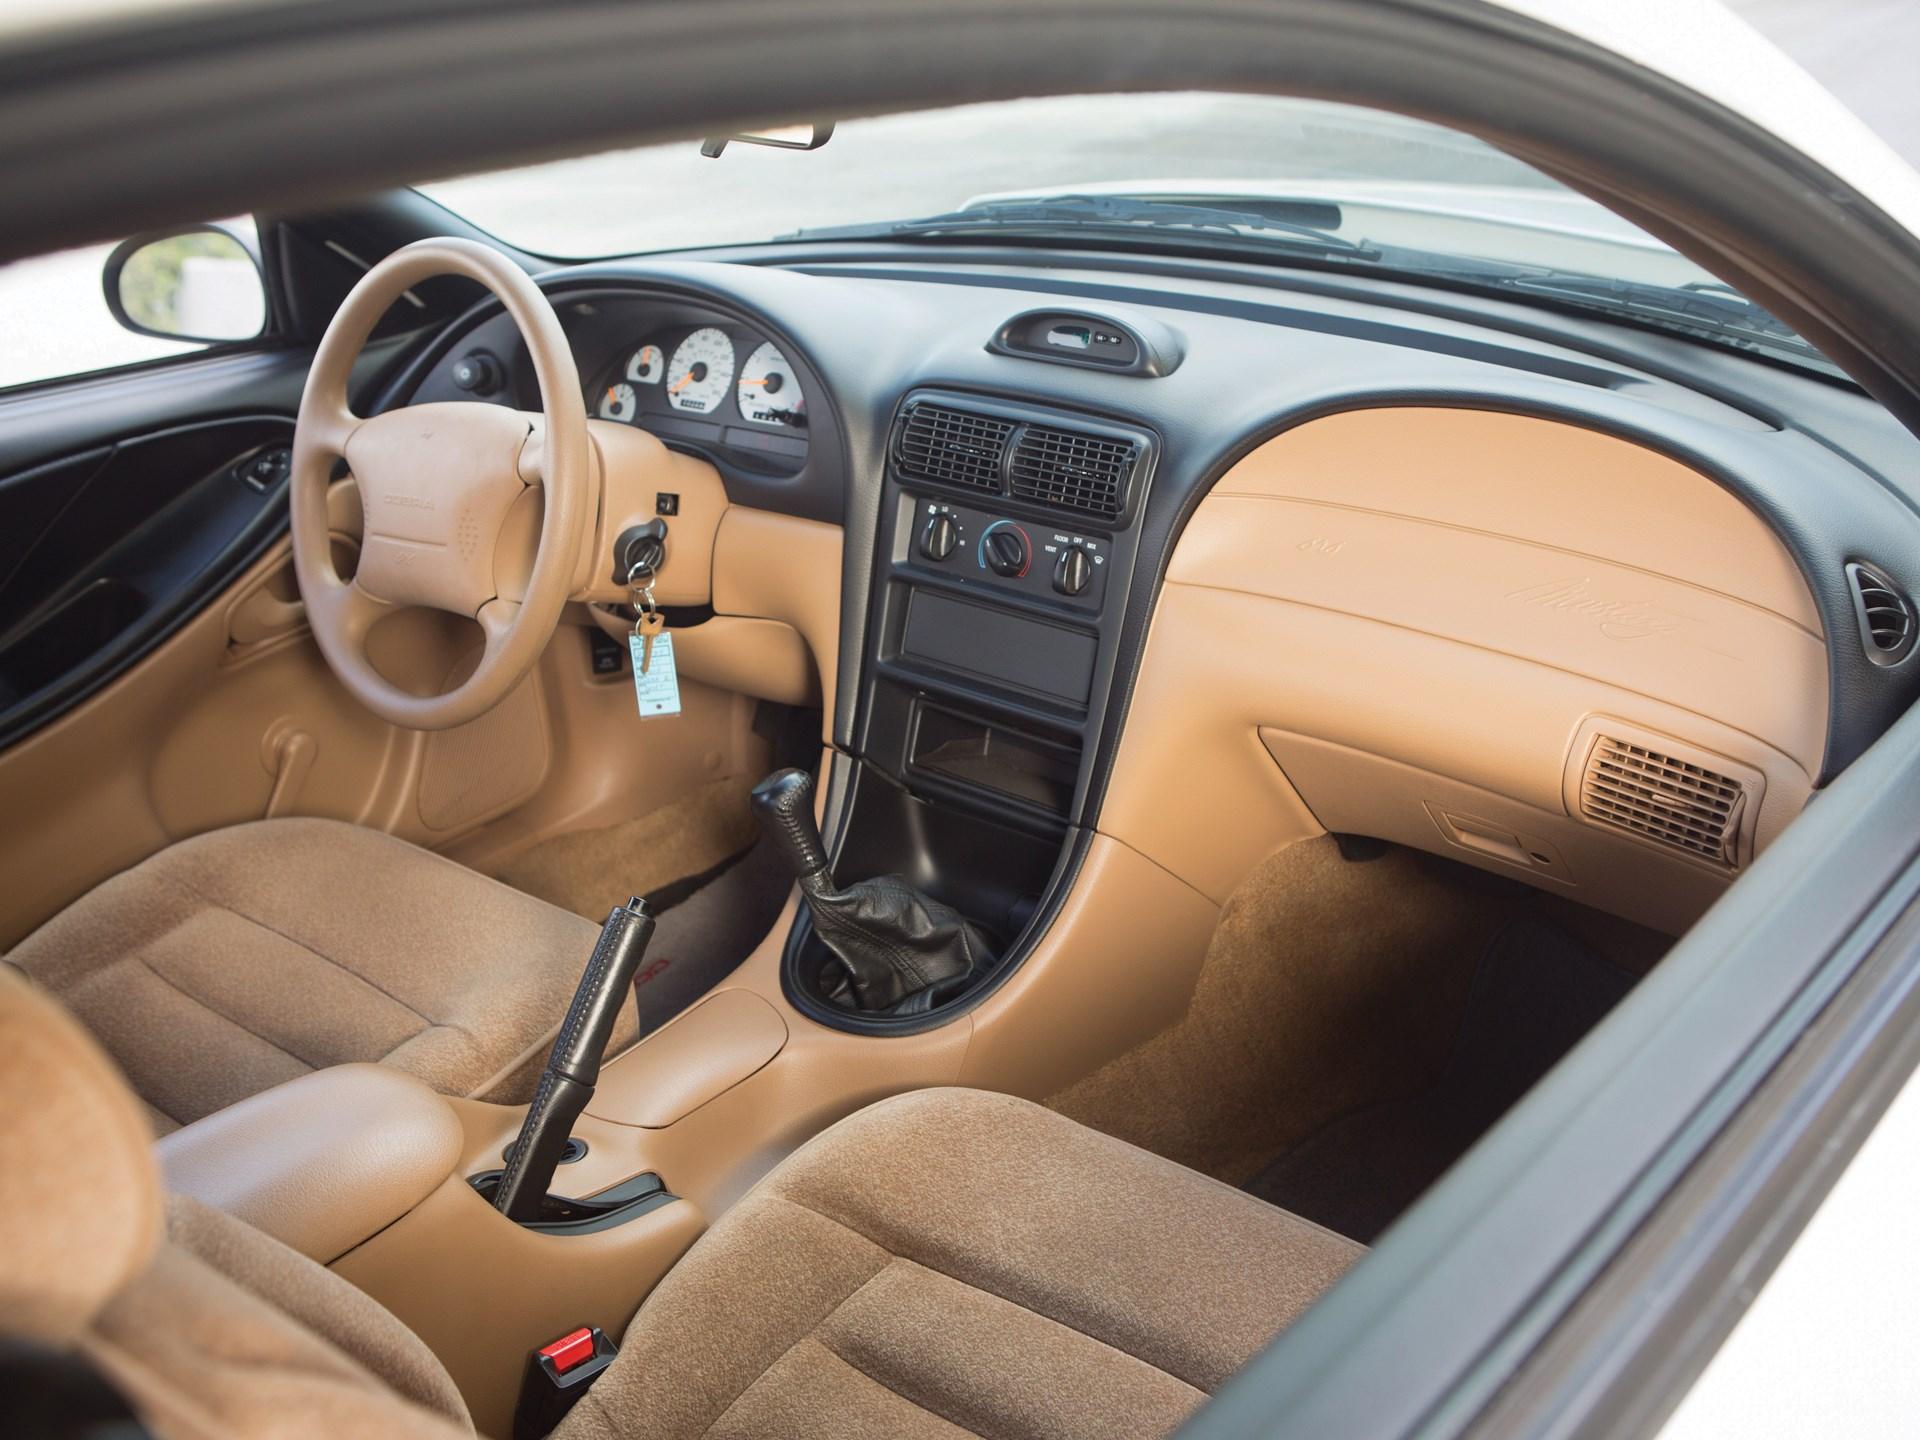 1995 Ford Mustang SVT Cobra R passenter interior